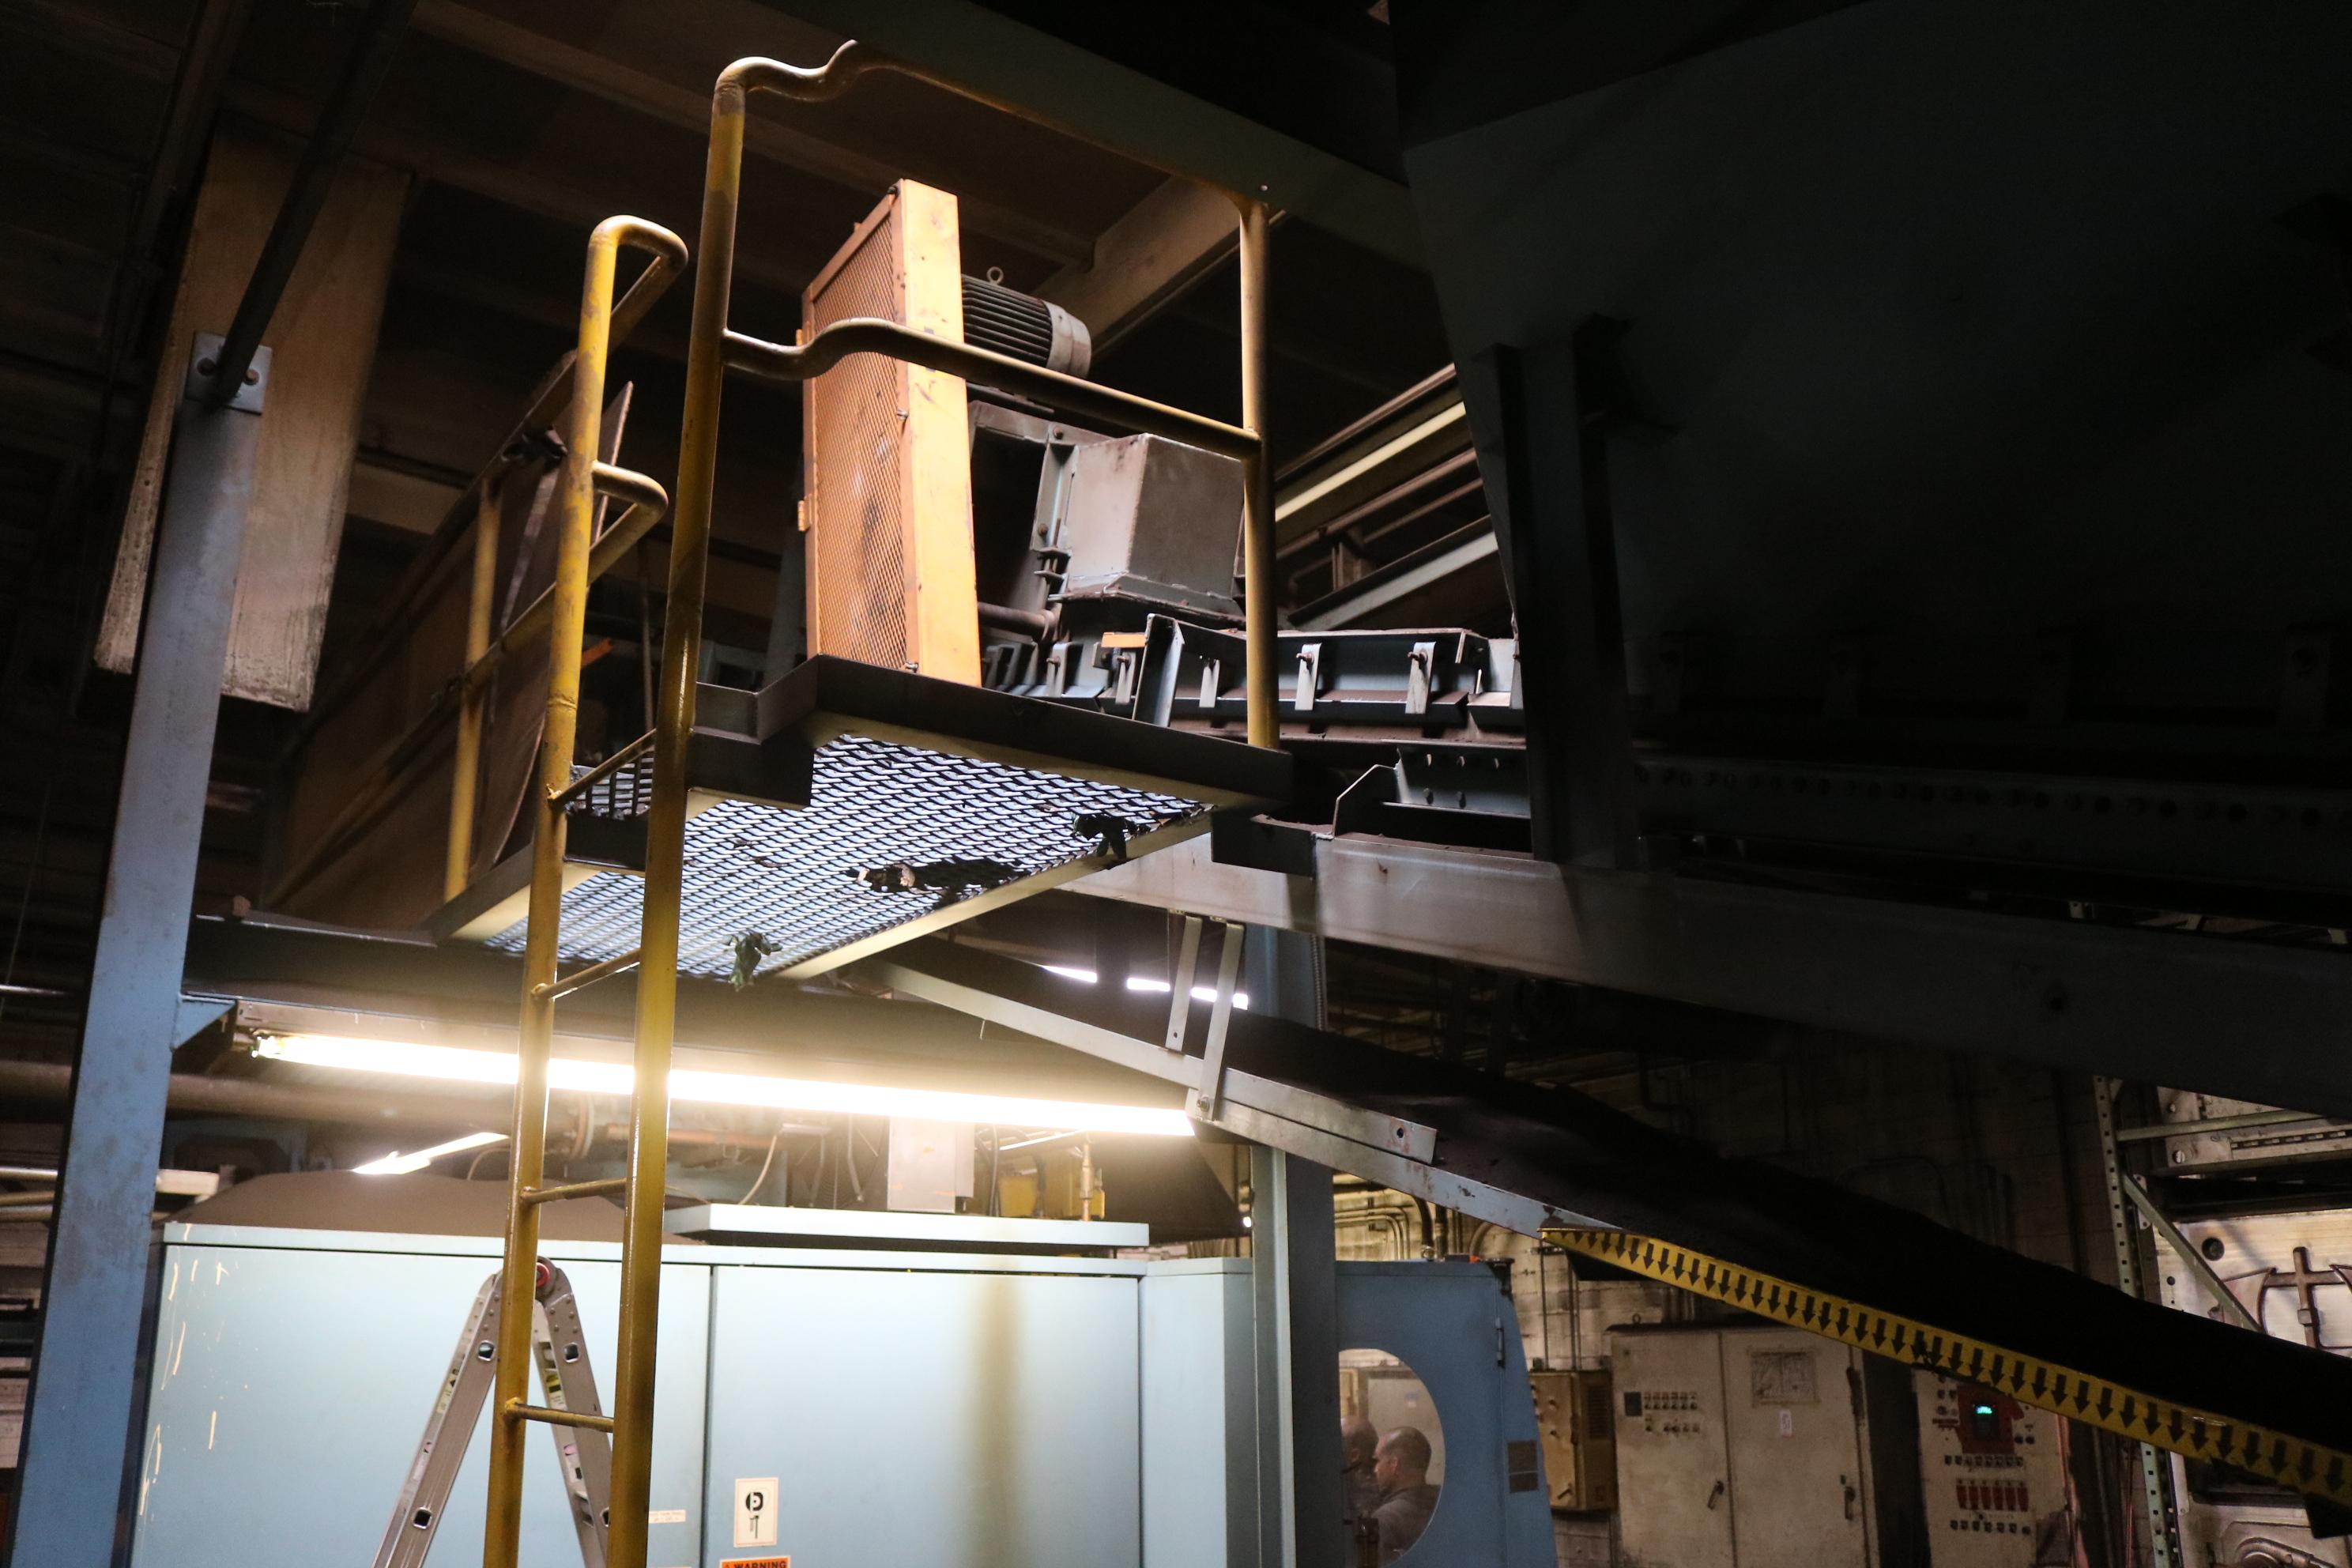 "Lot 50 - 2001 DISAMATIC MODEL DISAMATCH 130 AUTOMATIC MOLDING MACHINE, FEED 24"" X 20"" FLASKS, BELT CONVEYOR"